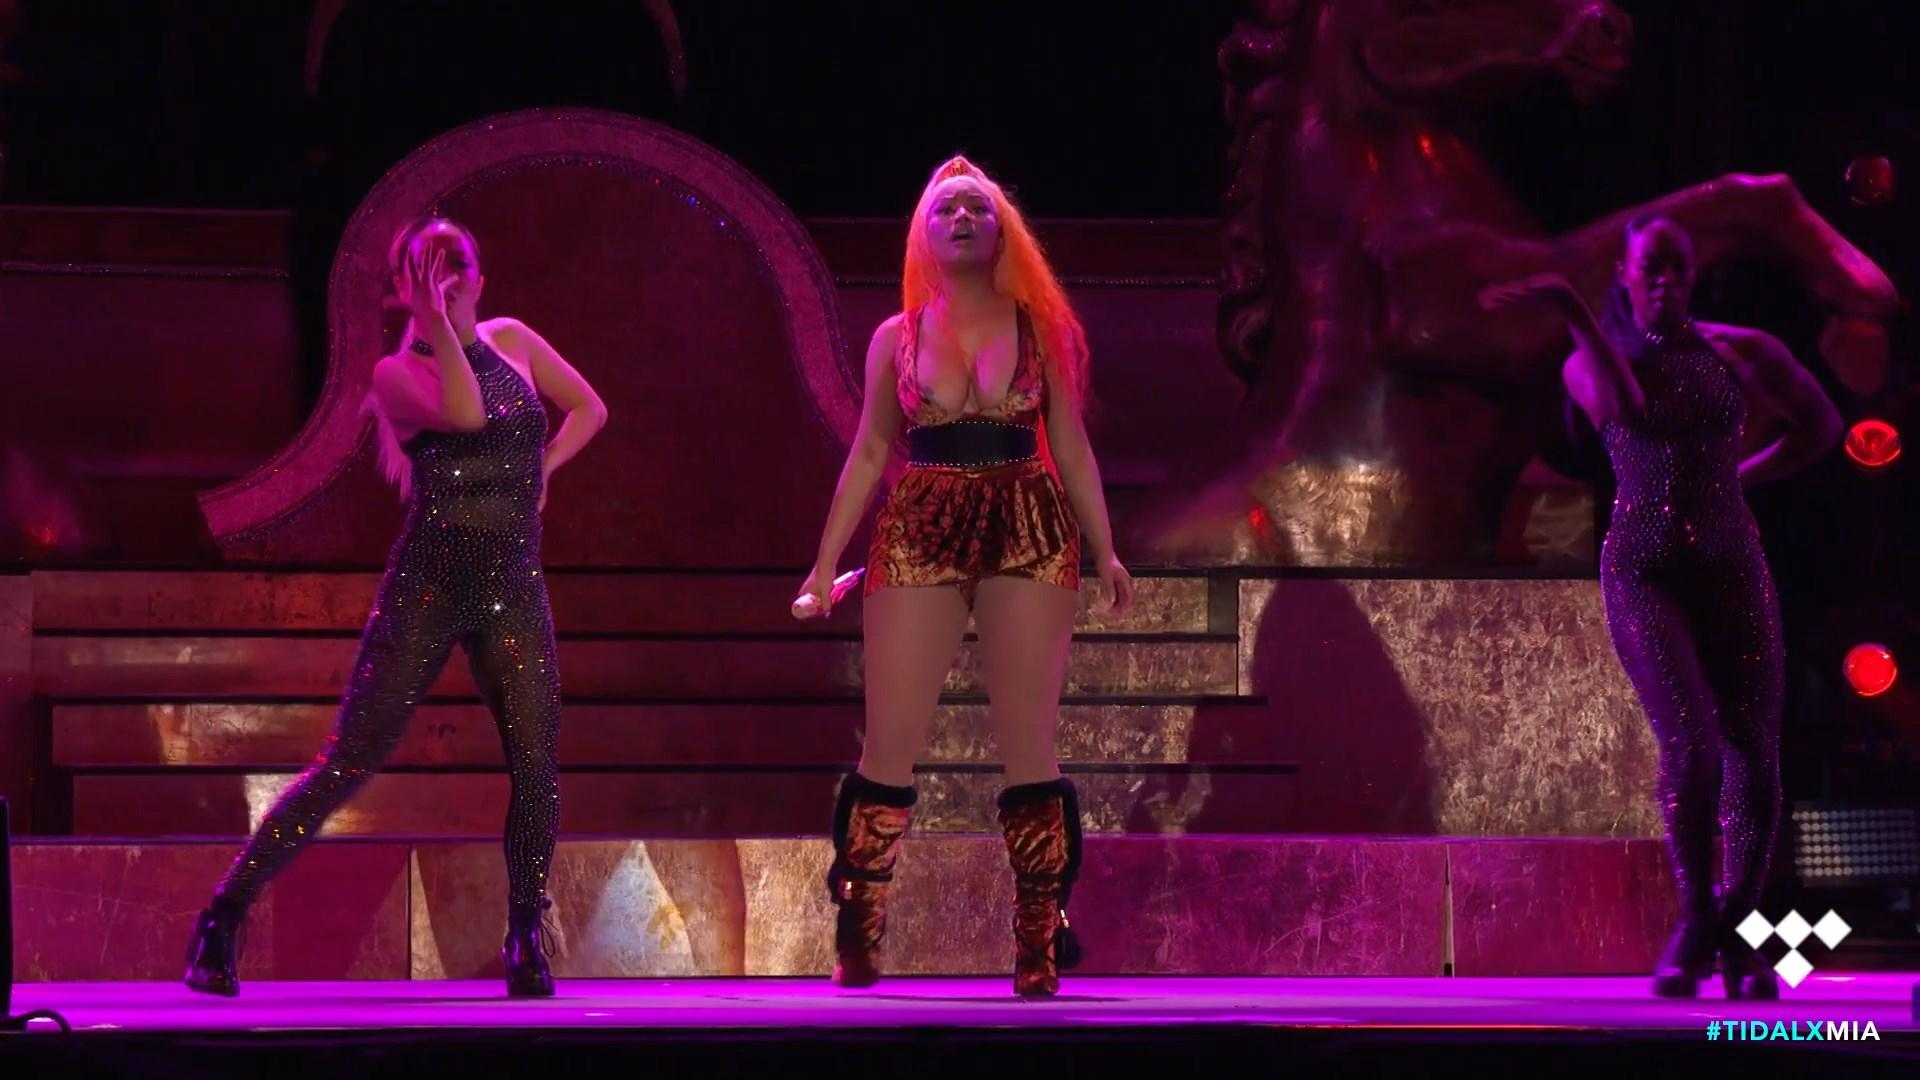 Nicki-Minaj-Nude-TheFappeningBlog.com-18.jpg